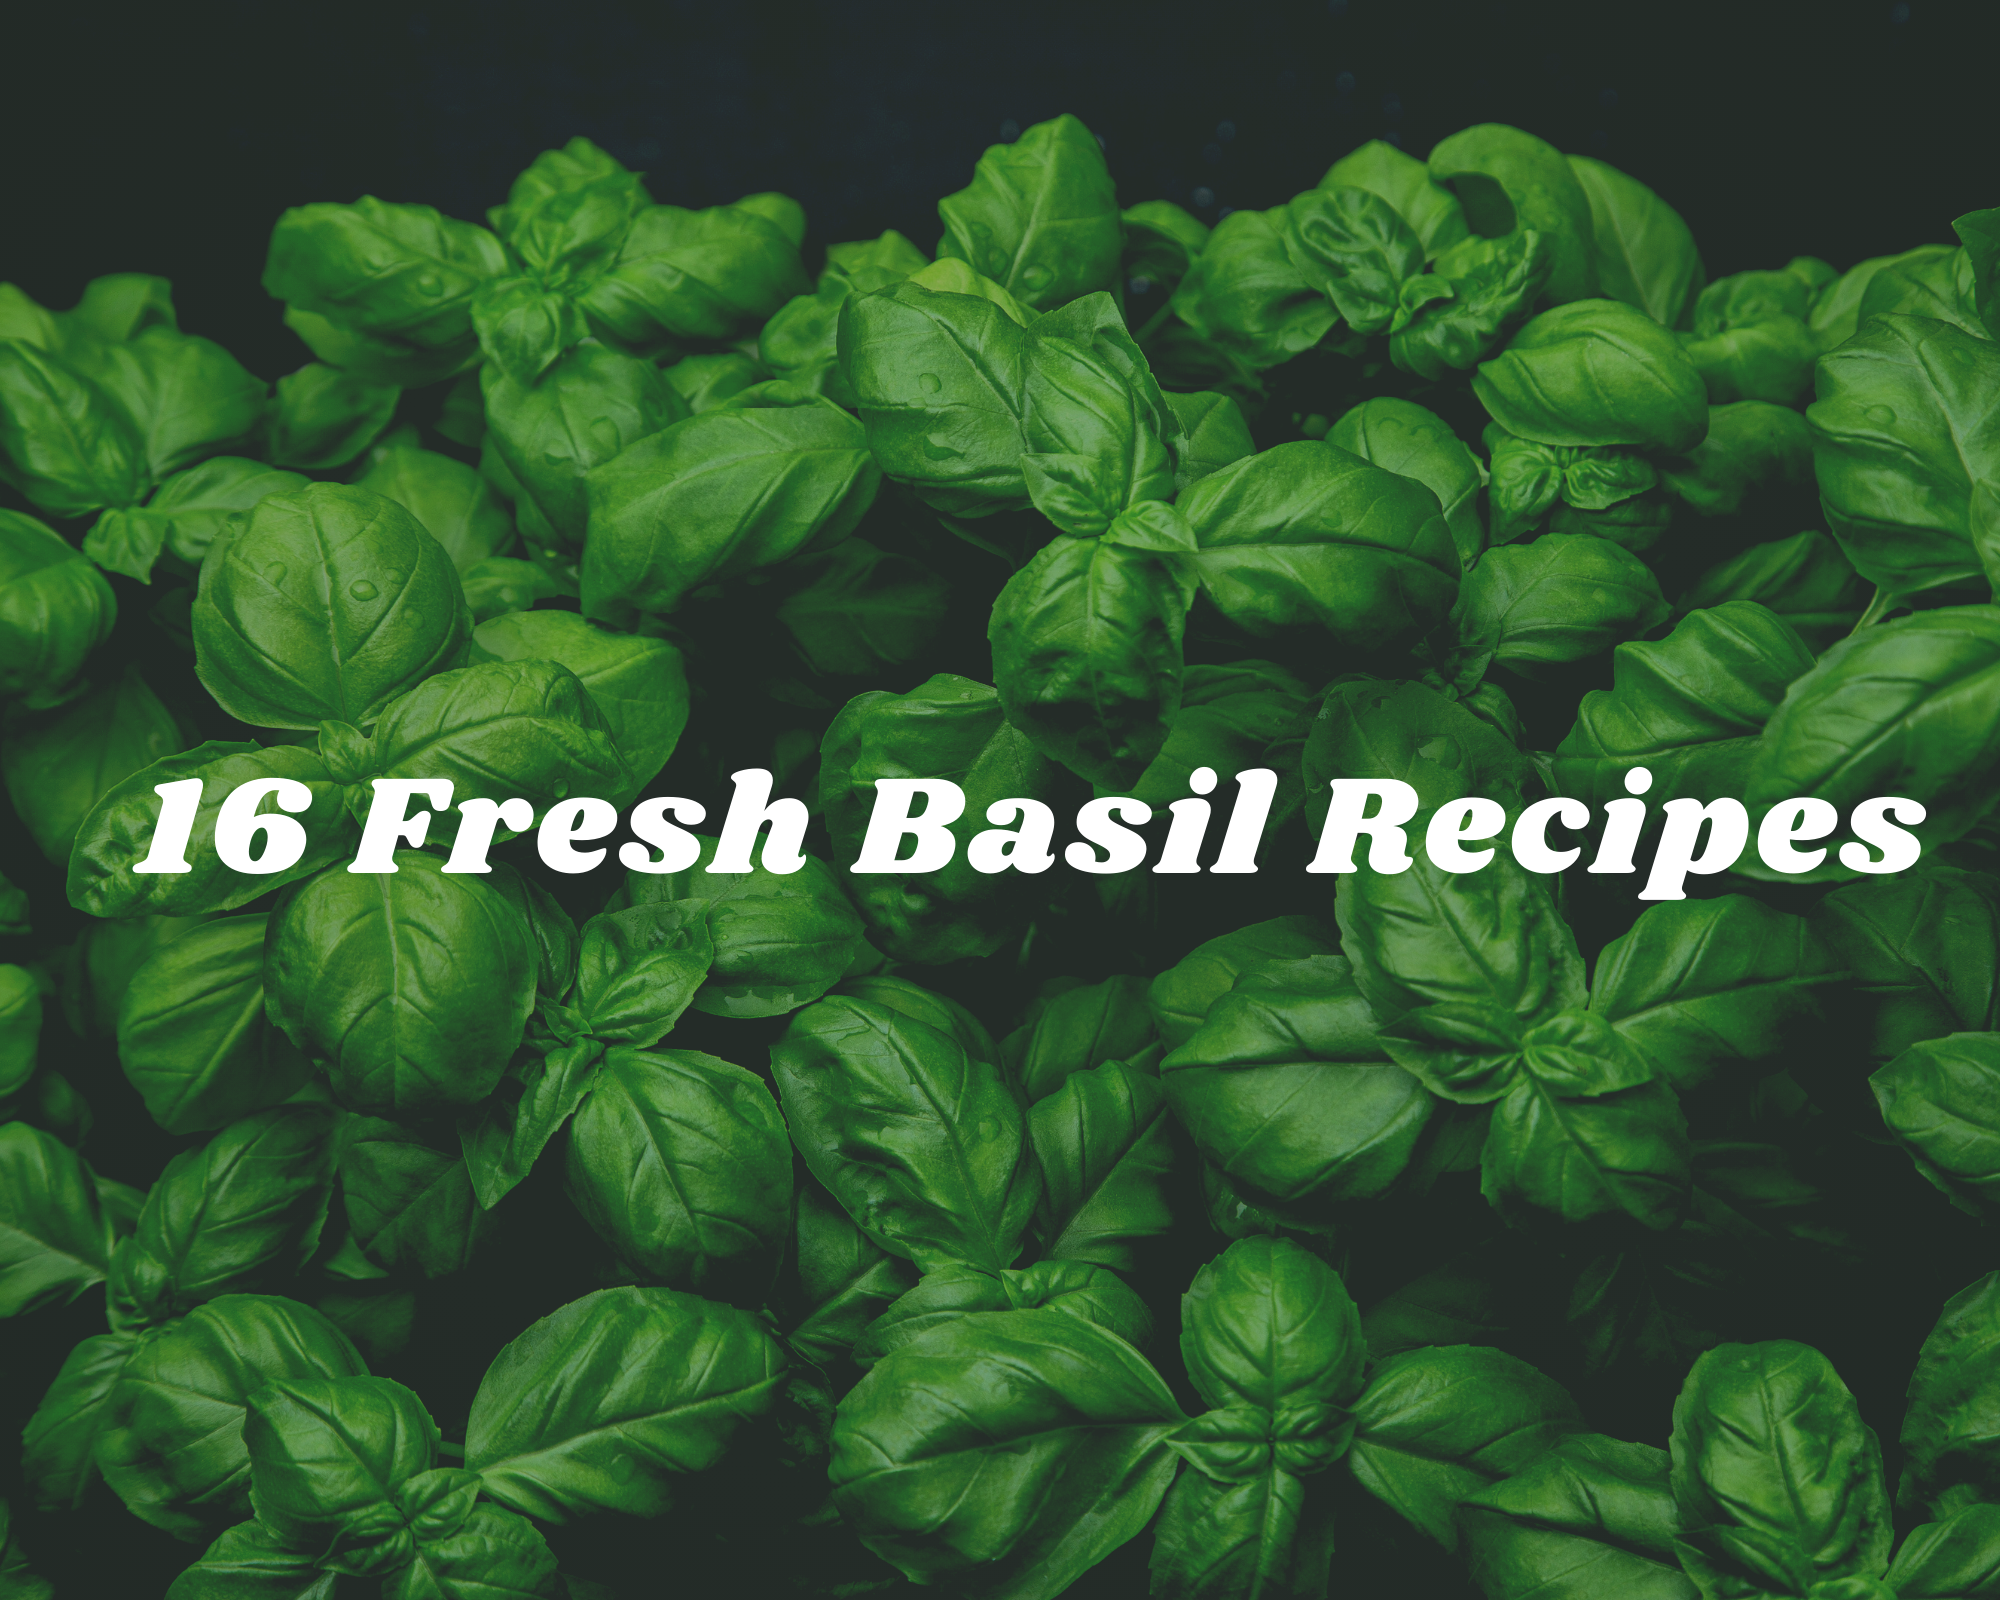 Summer recipes using fresh basil